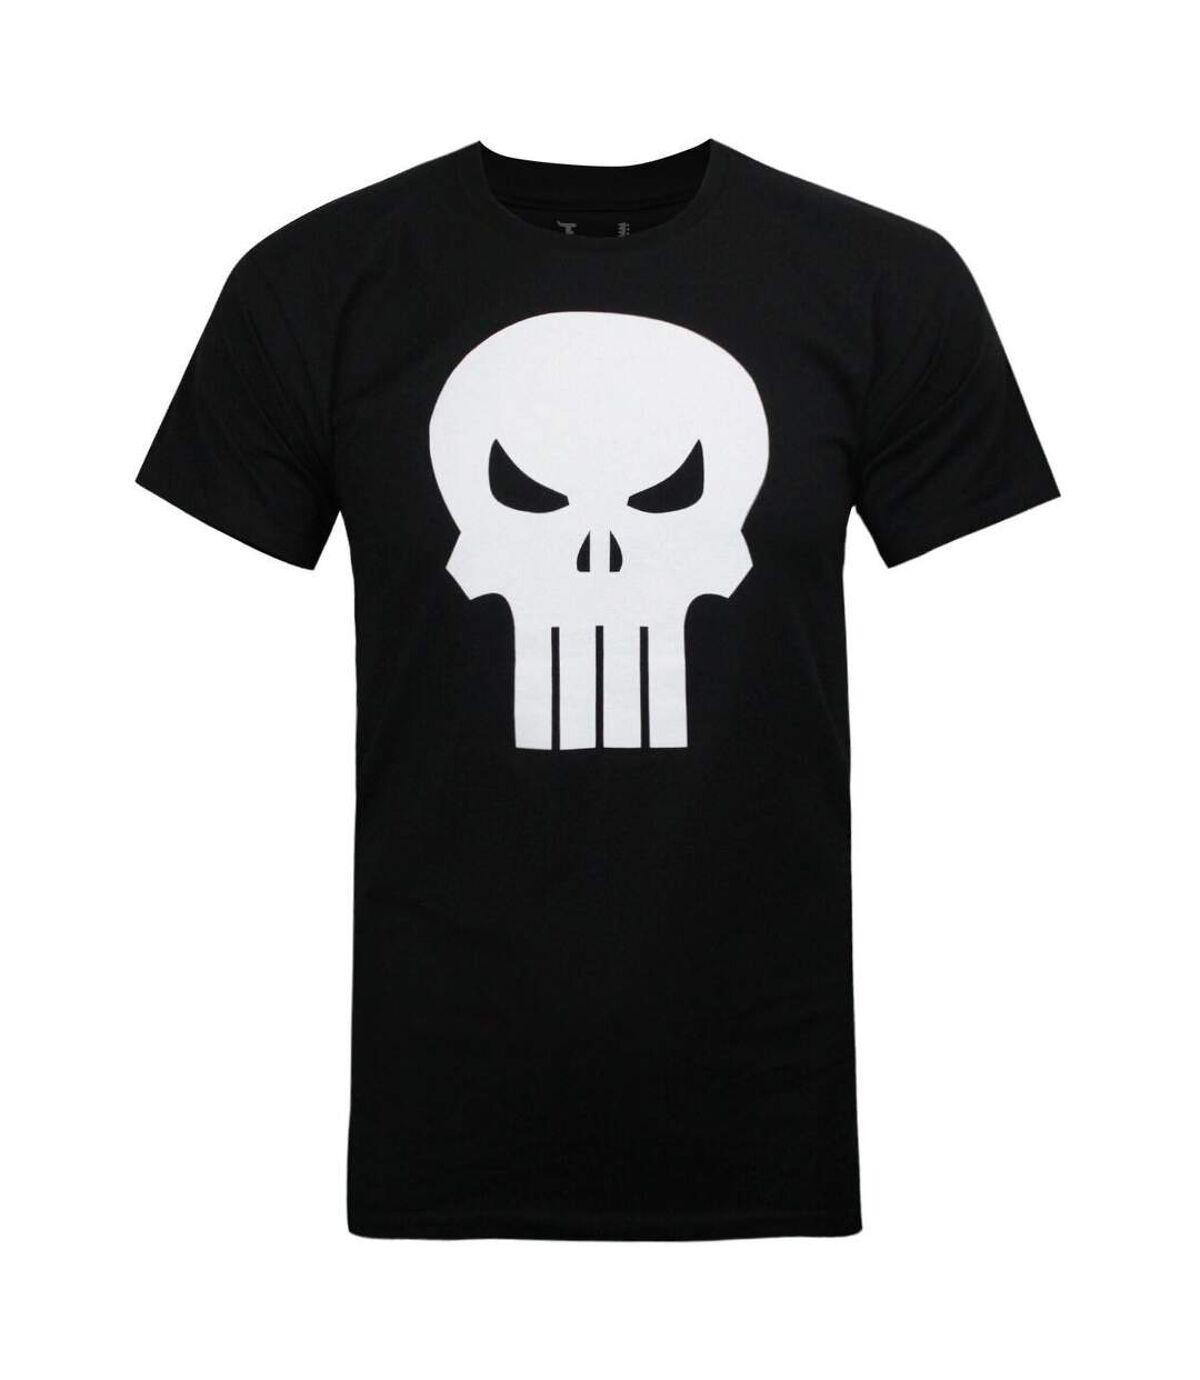 The Punisher Mens Logo T-Shirt (Black) - UTNS5481